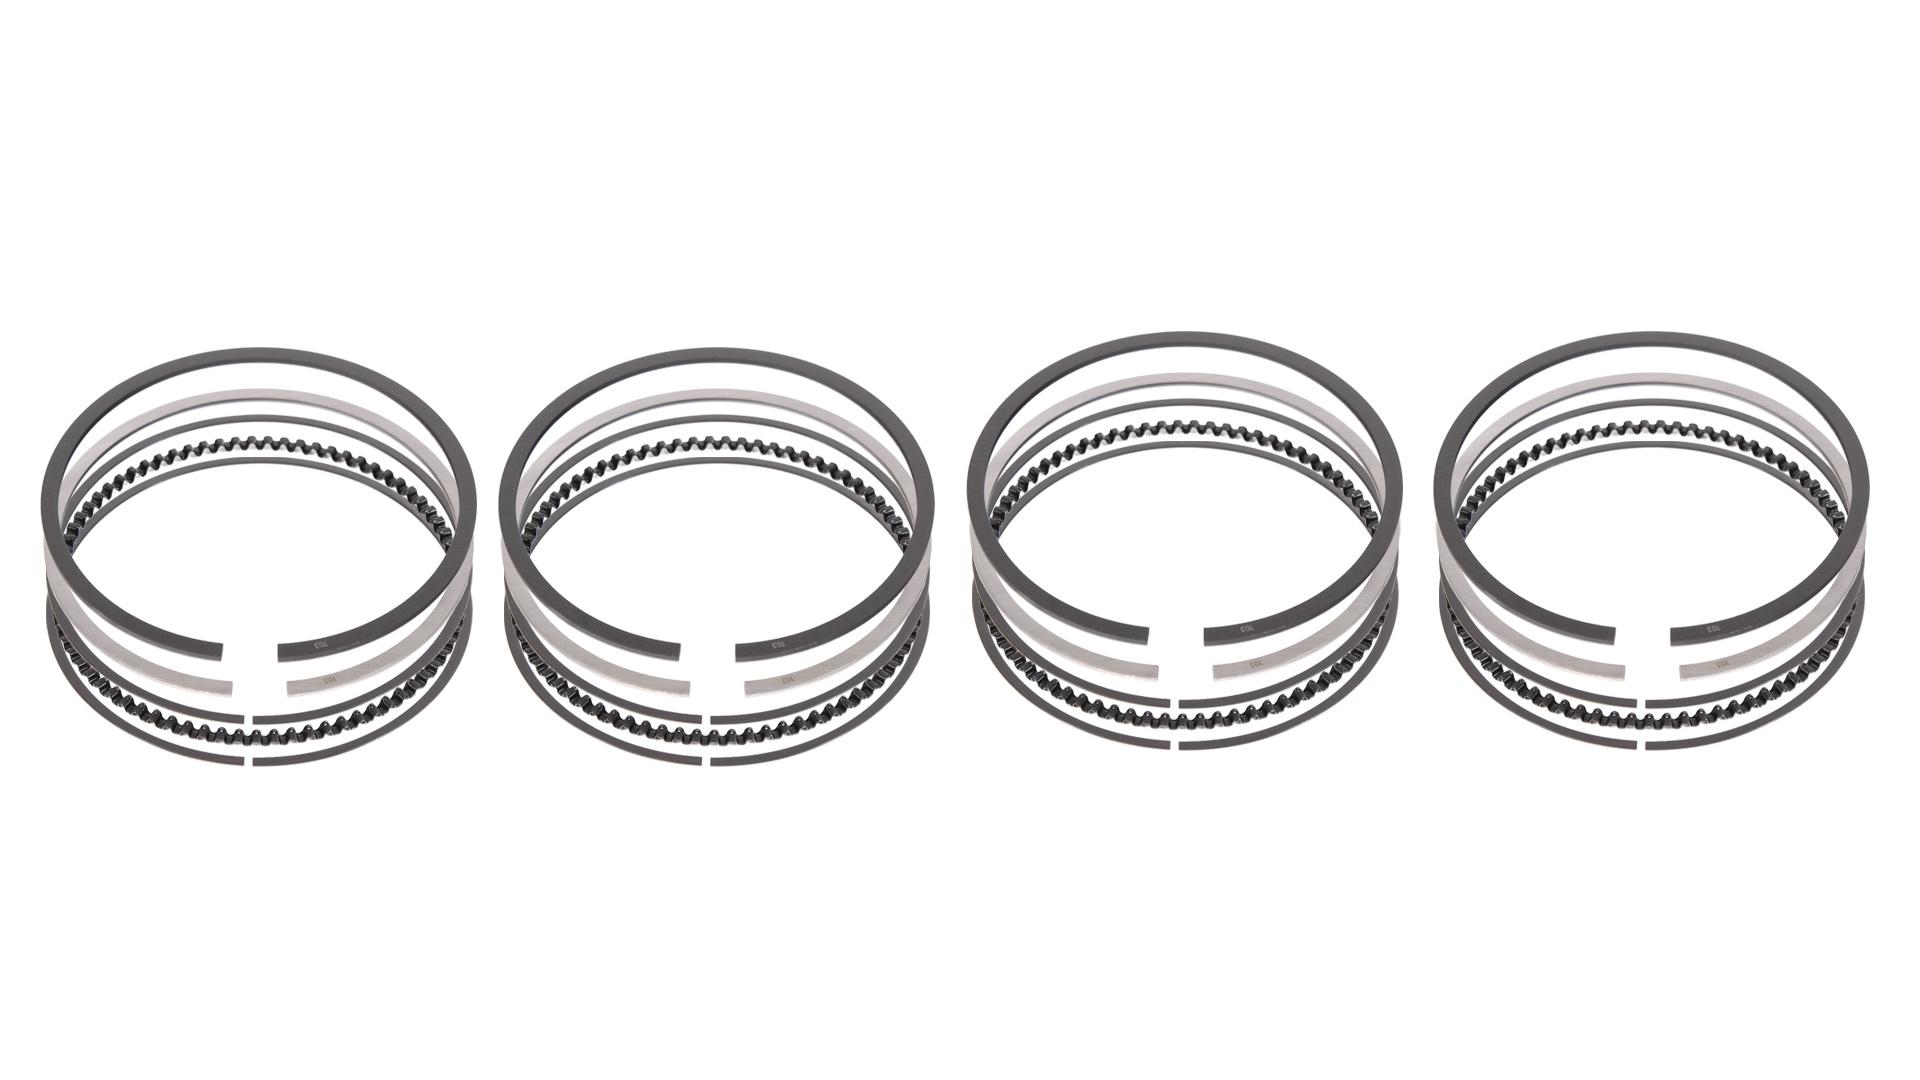 4x anneau de Piston jeu de Segments de piston Audi Seat Skoda VW A2 1,4 16V AUA 030198151E NOUVEAU